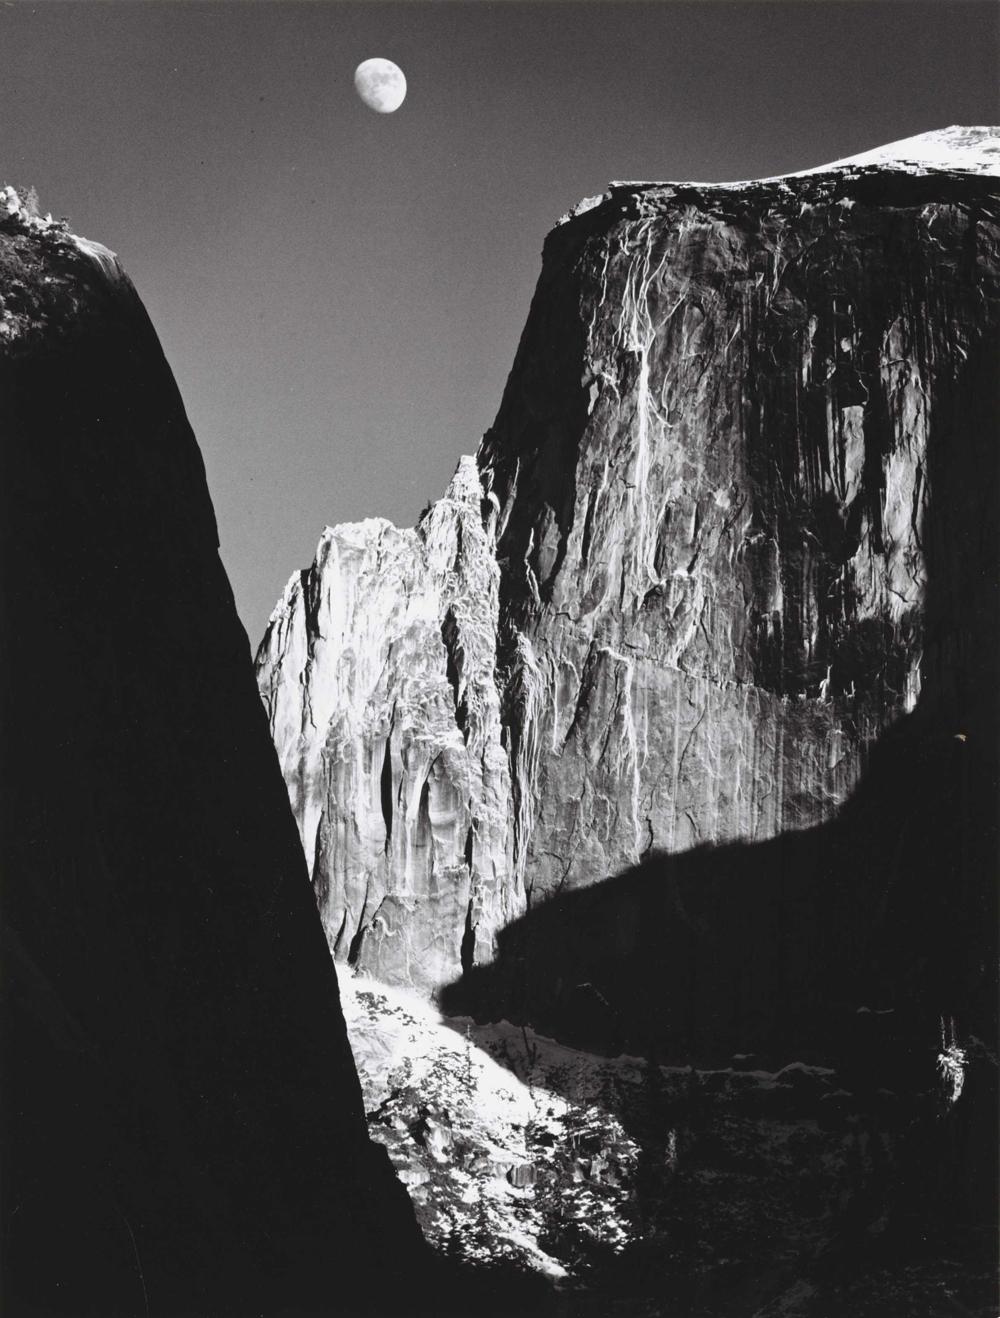 Ansel Adams, Moon and Half Dome, Yosemite National Park, CA, 1960